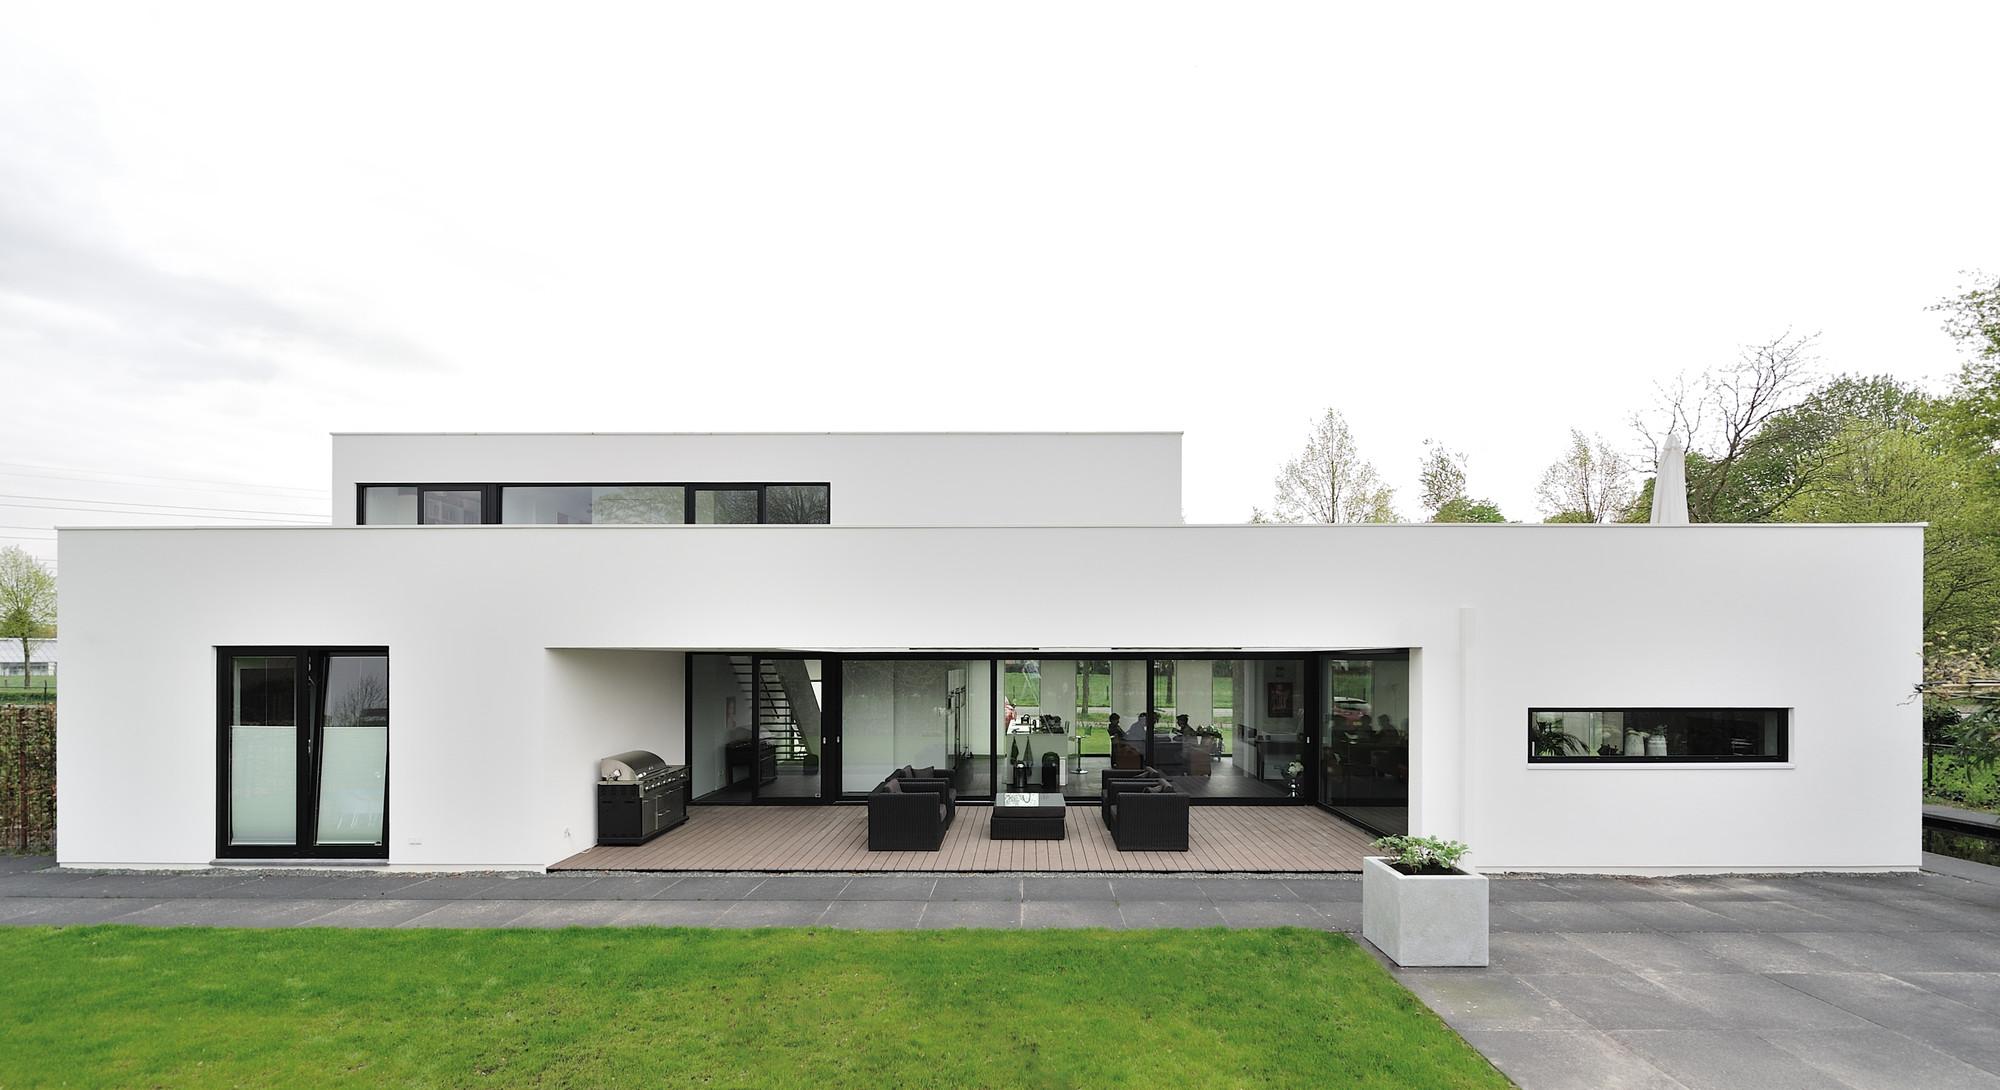 Residence Bemmel / Maxim Winkelaar + Bob Ronday, © Chiel de Nooyer